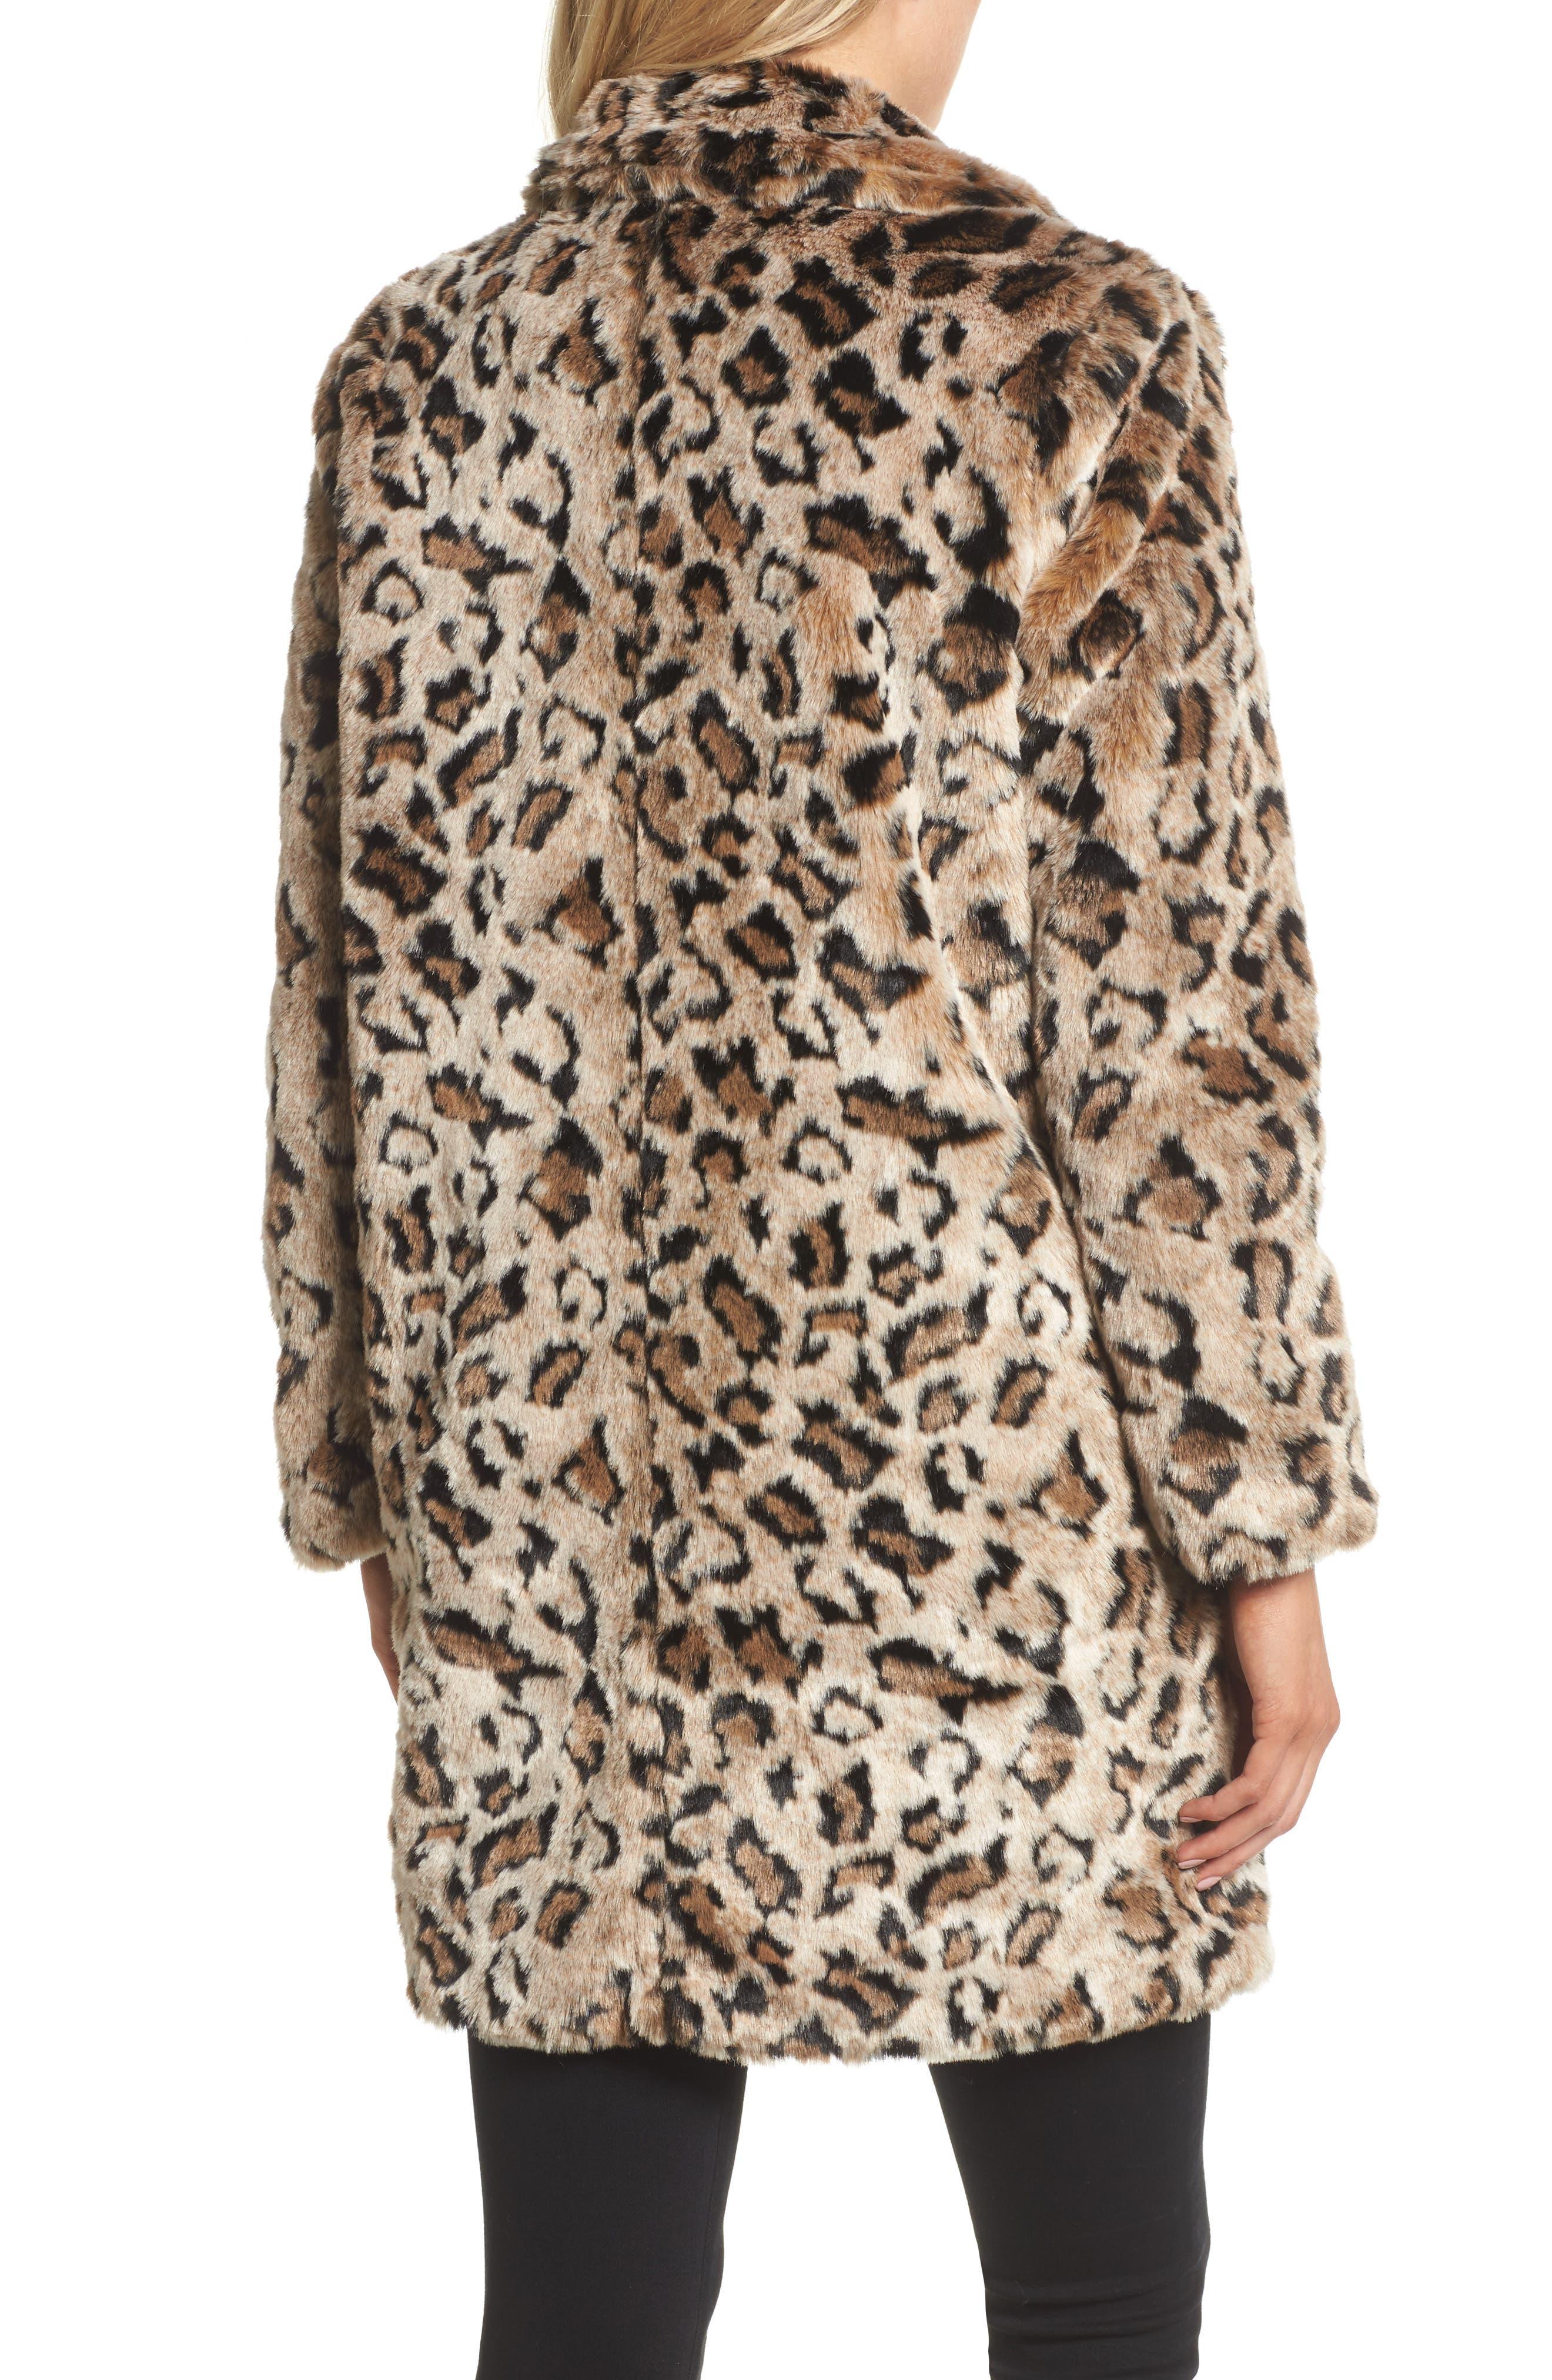 Abeni Faux Fur Coat,                             Alternate thumbnail 2, color,                             230